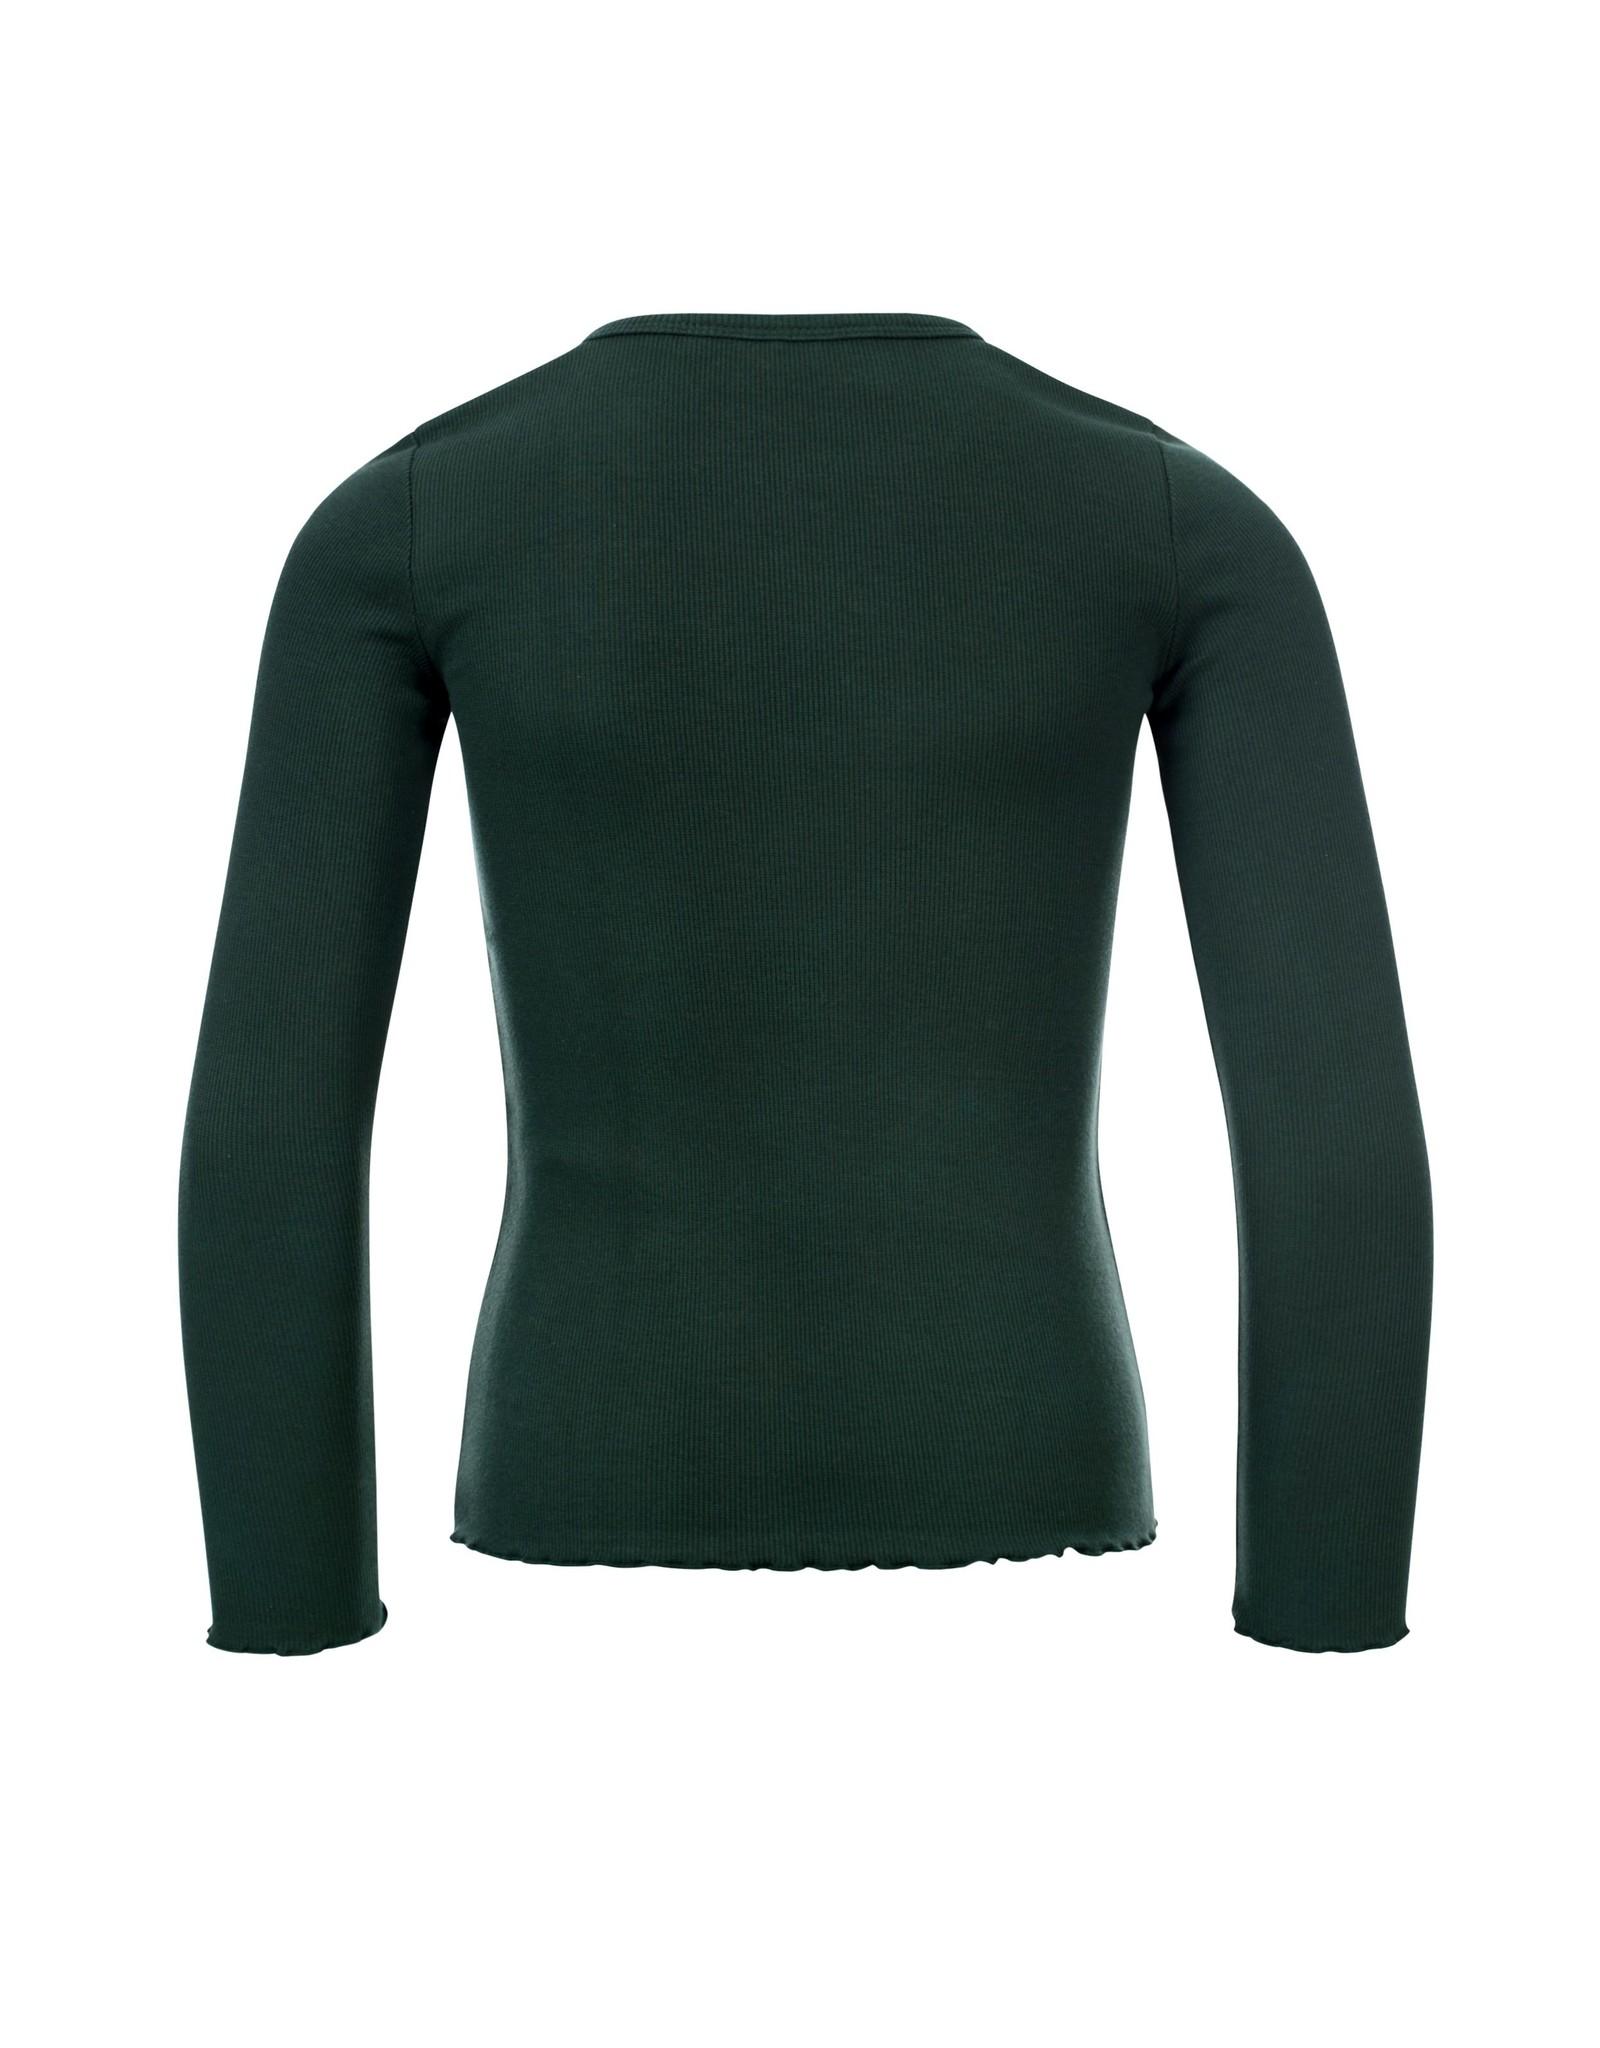 LOOXS Little Little rib t-shirt l. sleeve,  forrest